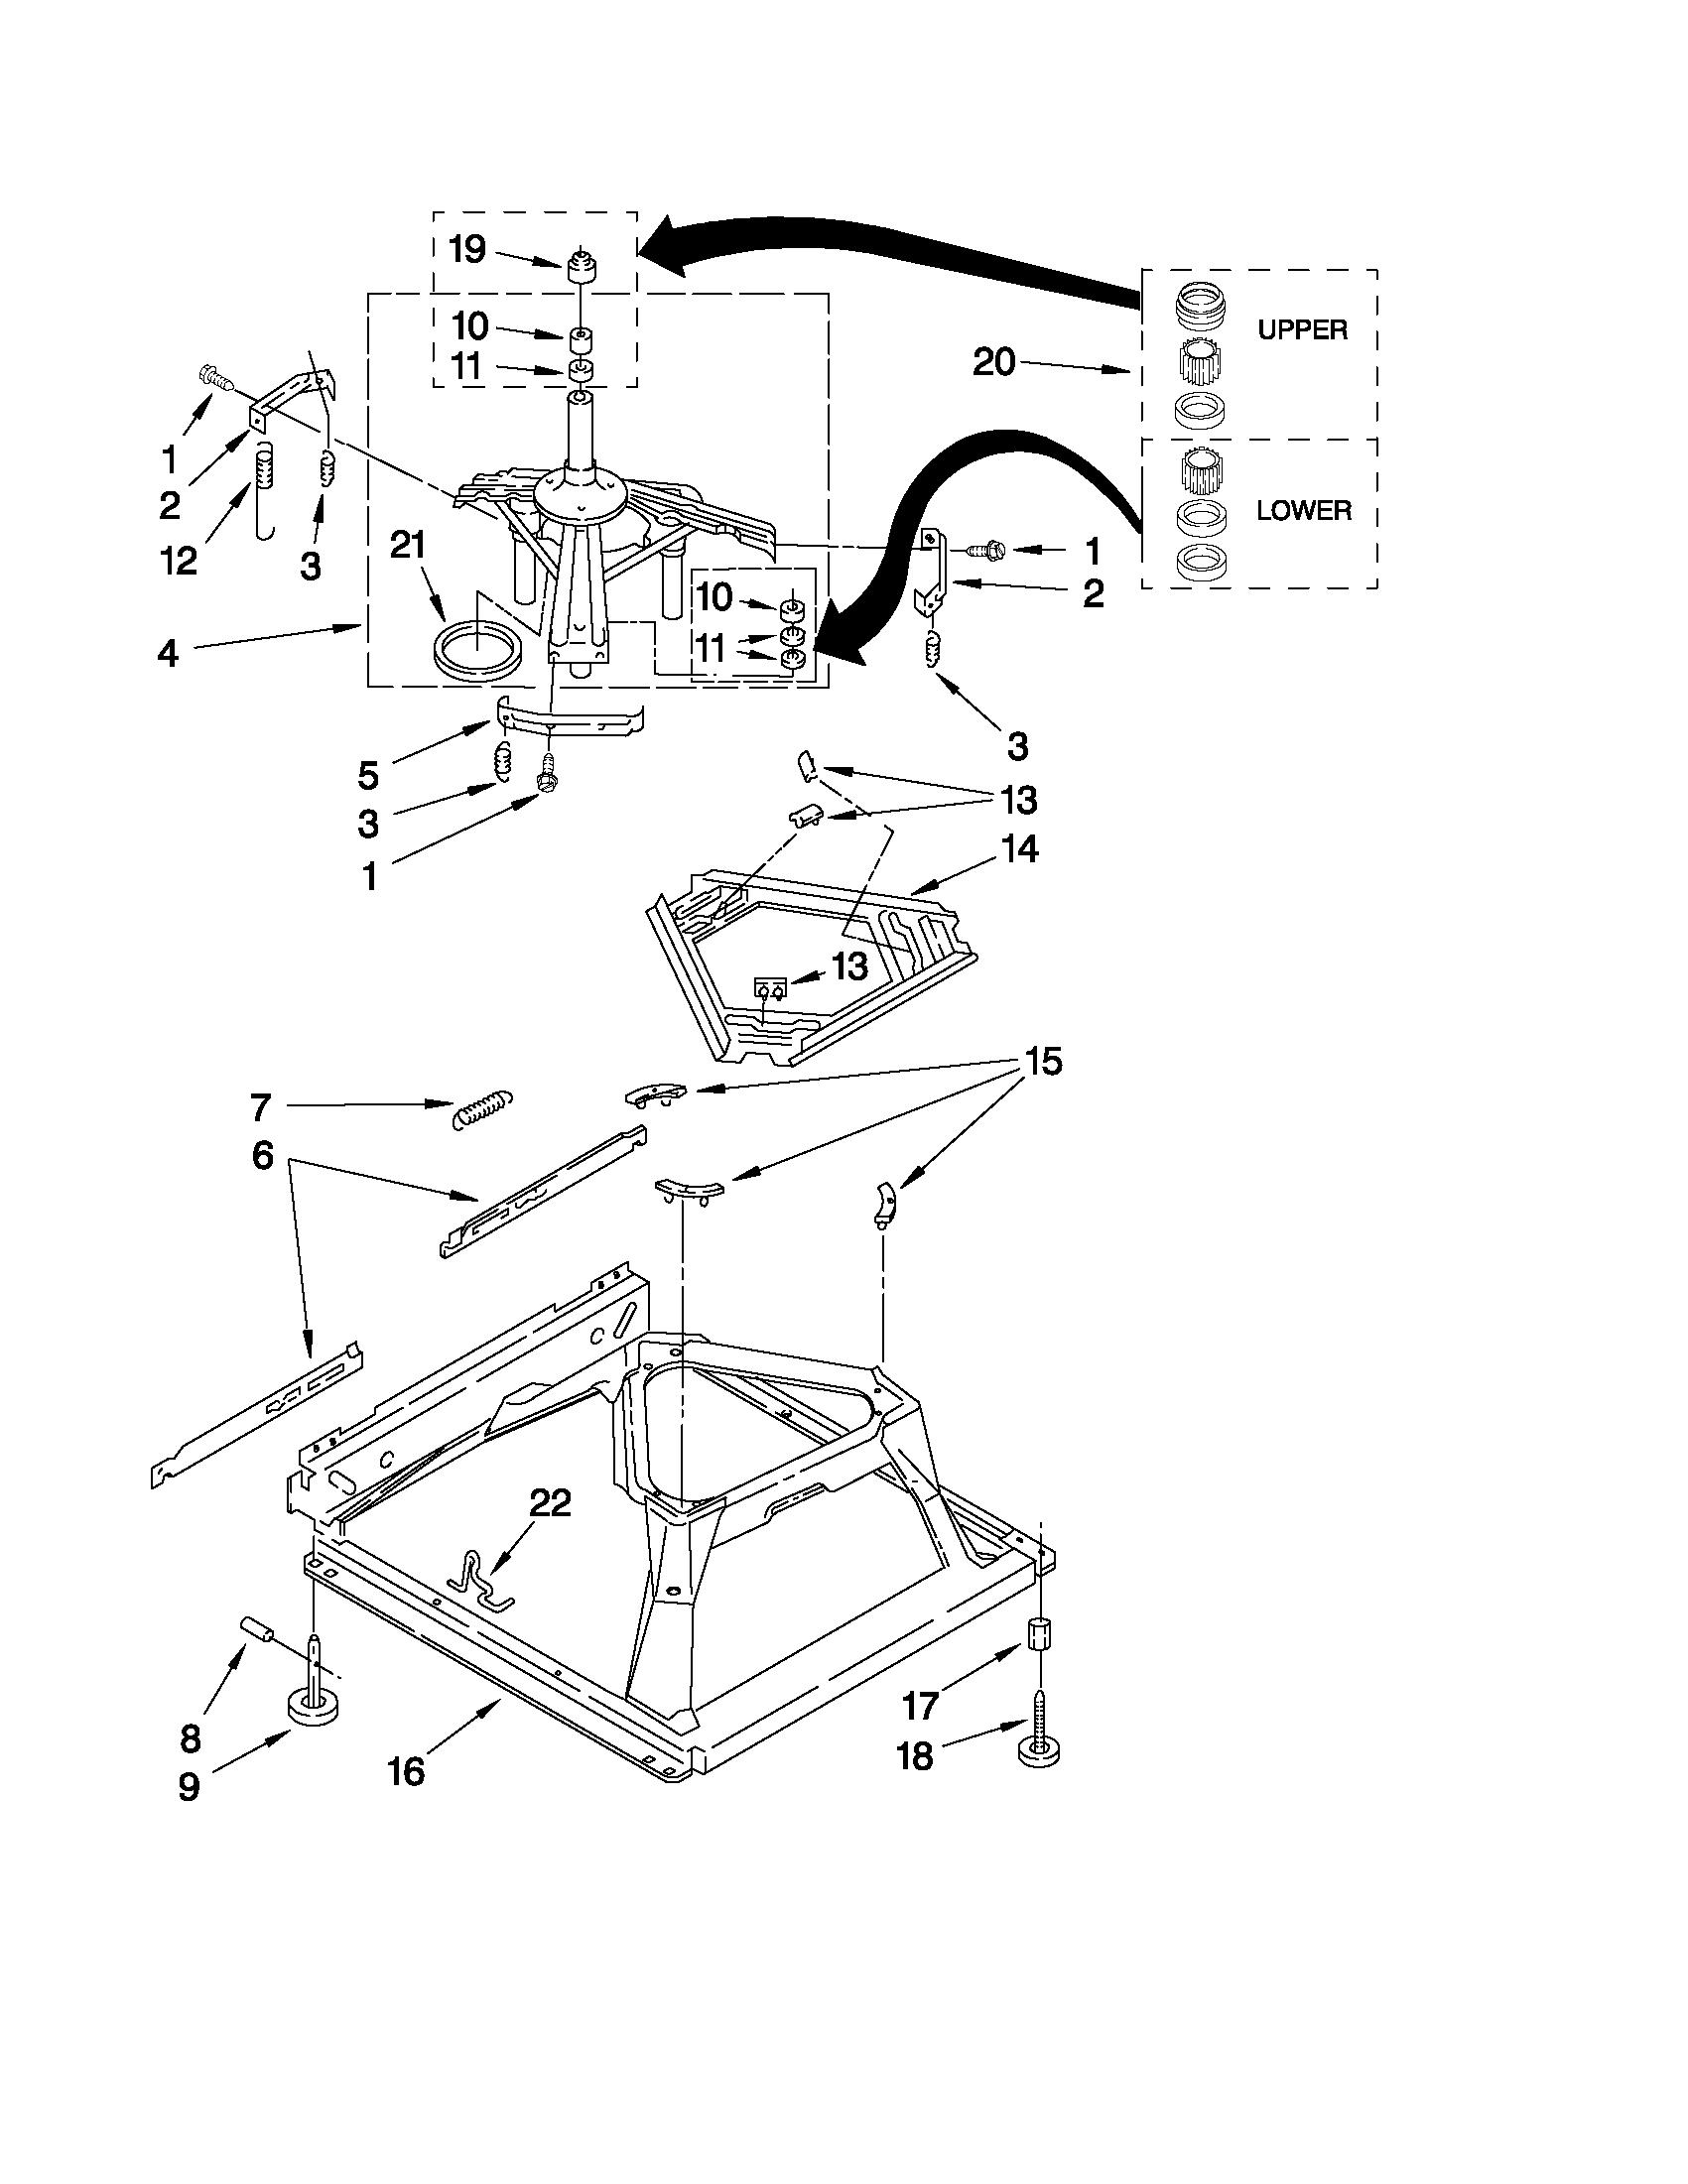 MAYTAG WASHER Parts | Model mvwc300vw1 | Sears PartsDirect